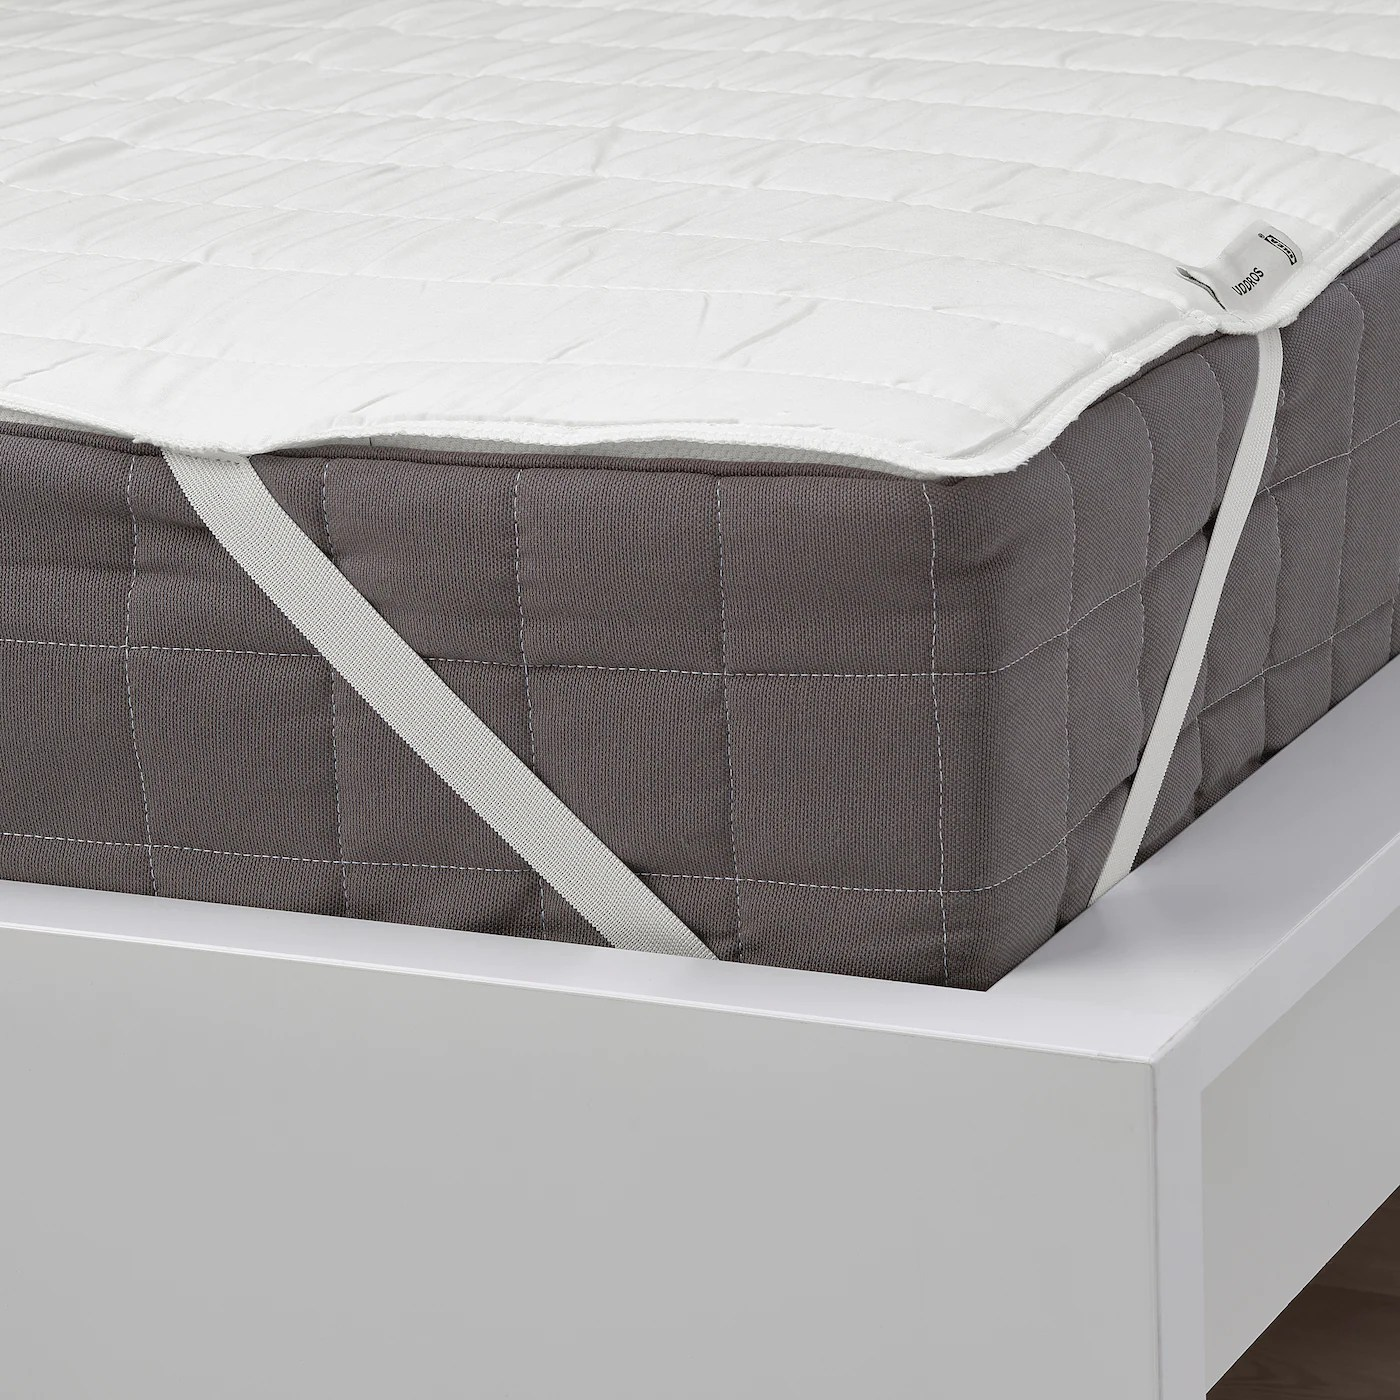 Luddros Alese 90x200 Cm Ikea